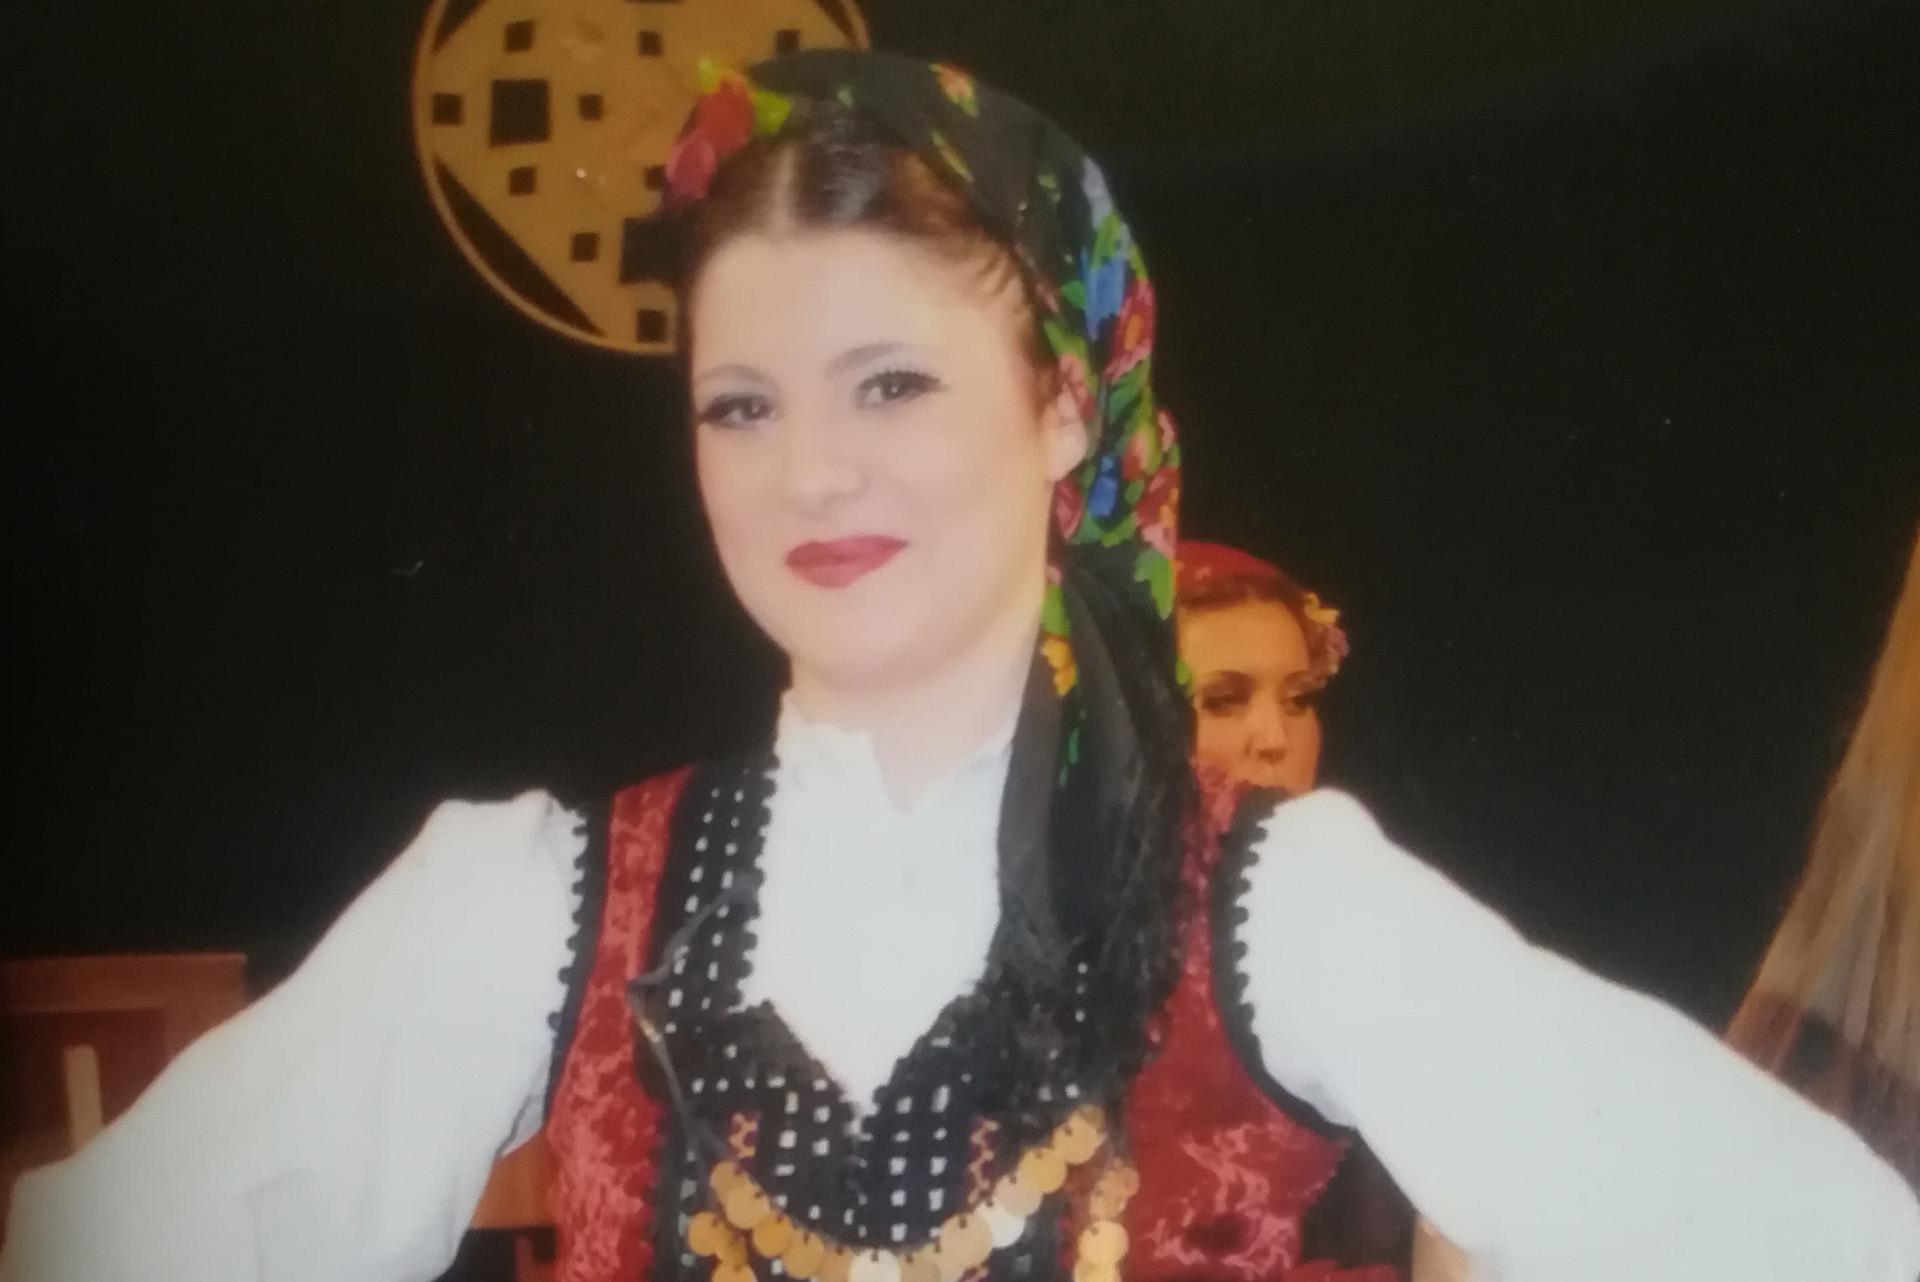 https://brankoradicevic.org.rs/wp-content/uploads/2019/03/Marija-Nikolic.jpg